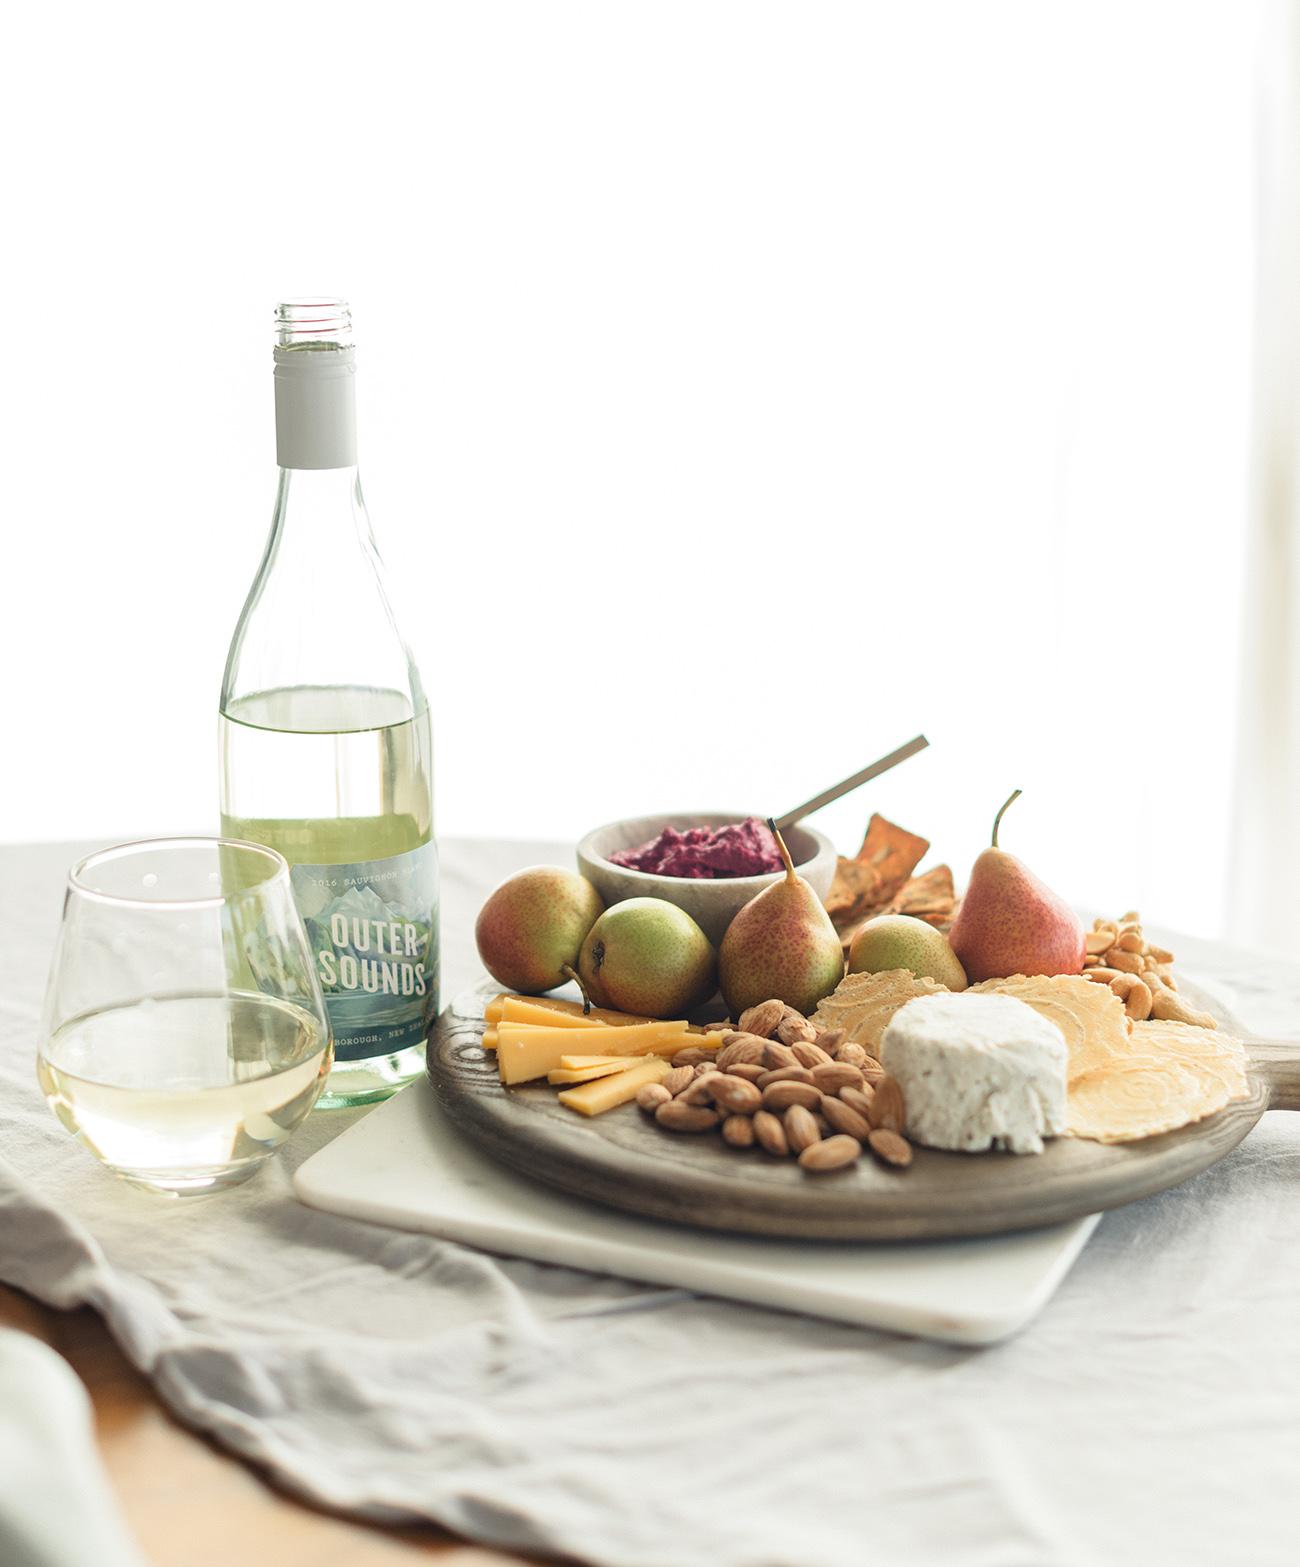 winc wine and cheeseboard